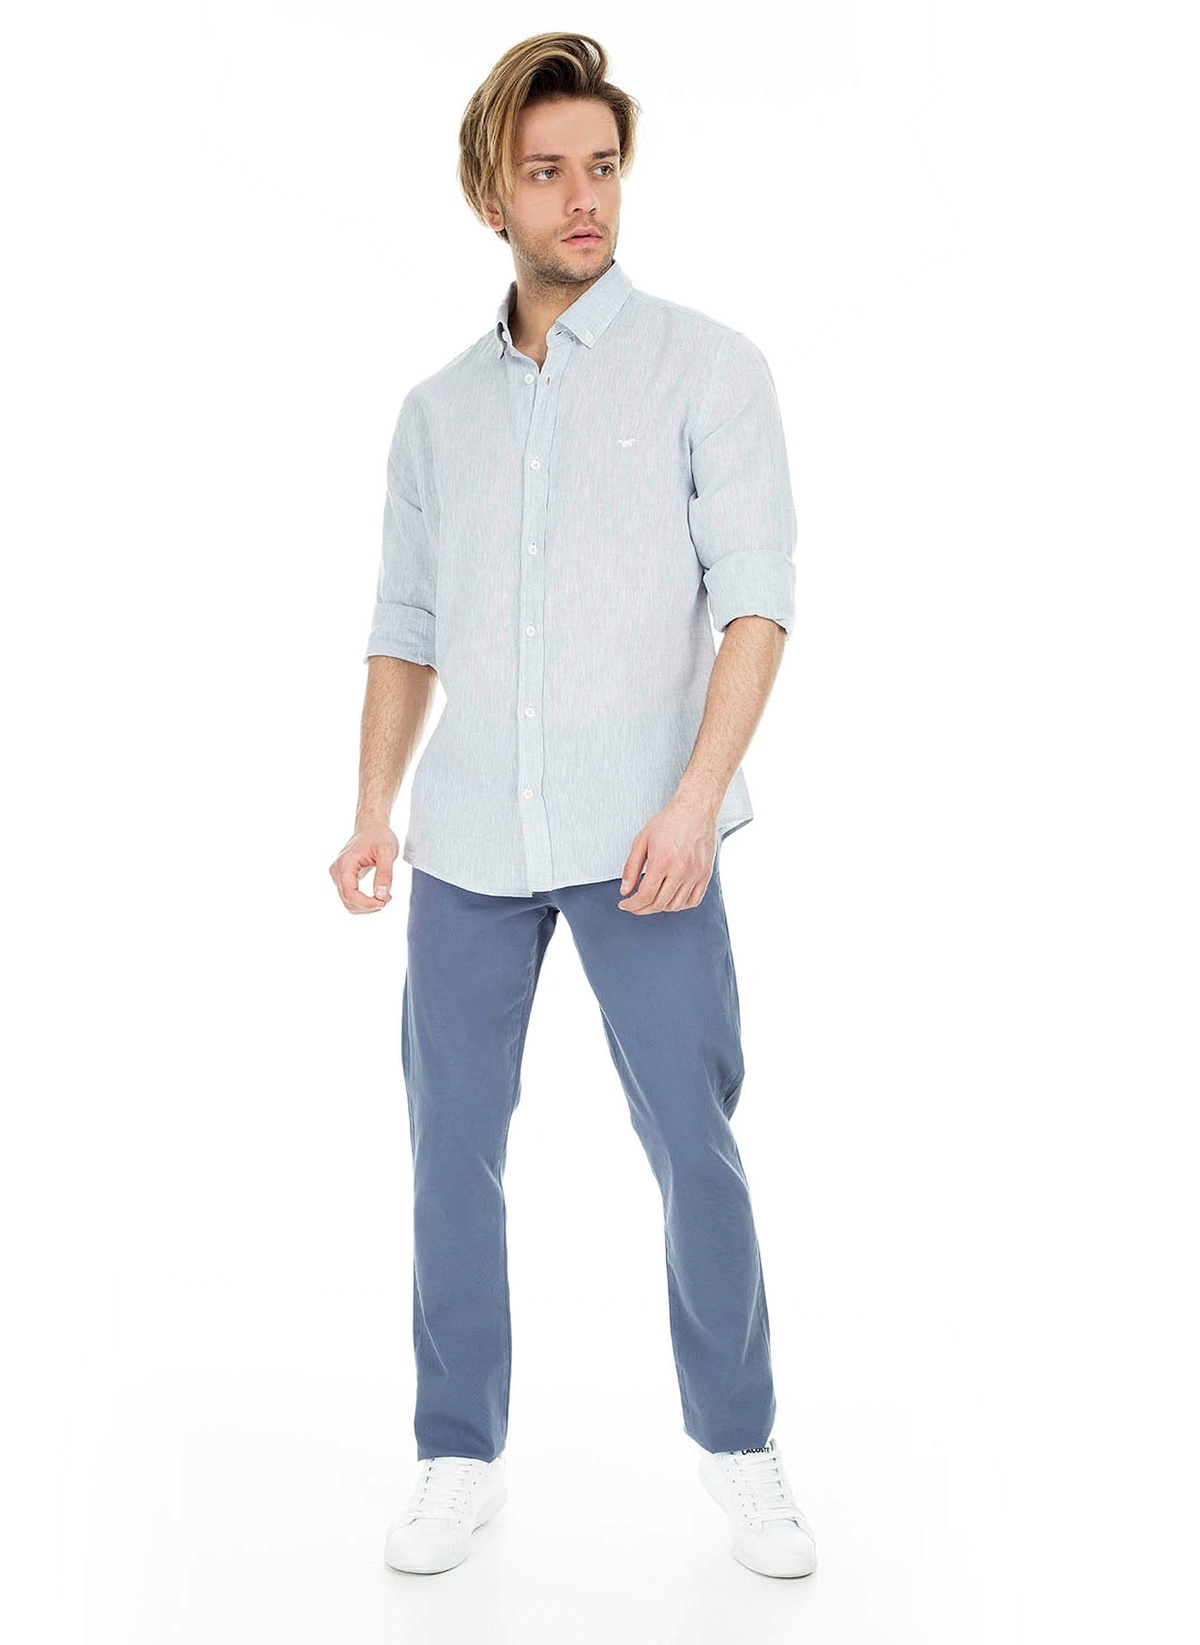 Frappoli Pantolon